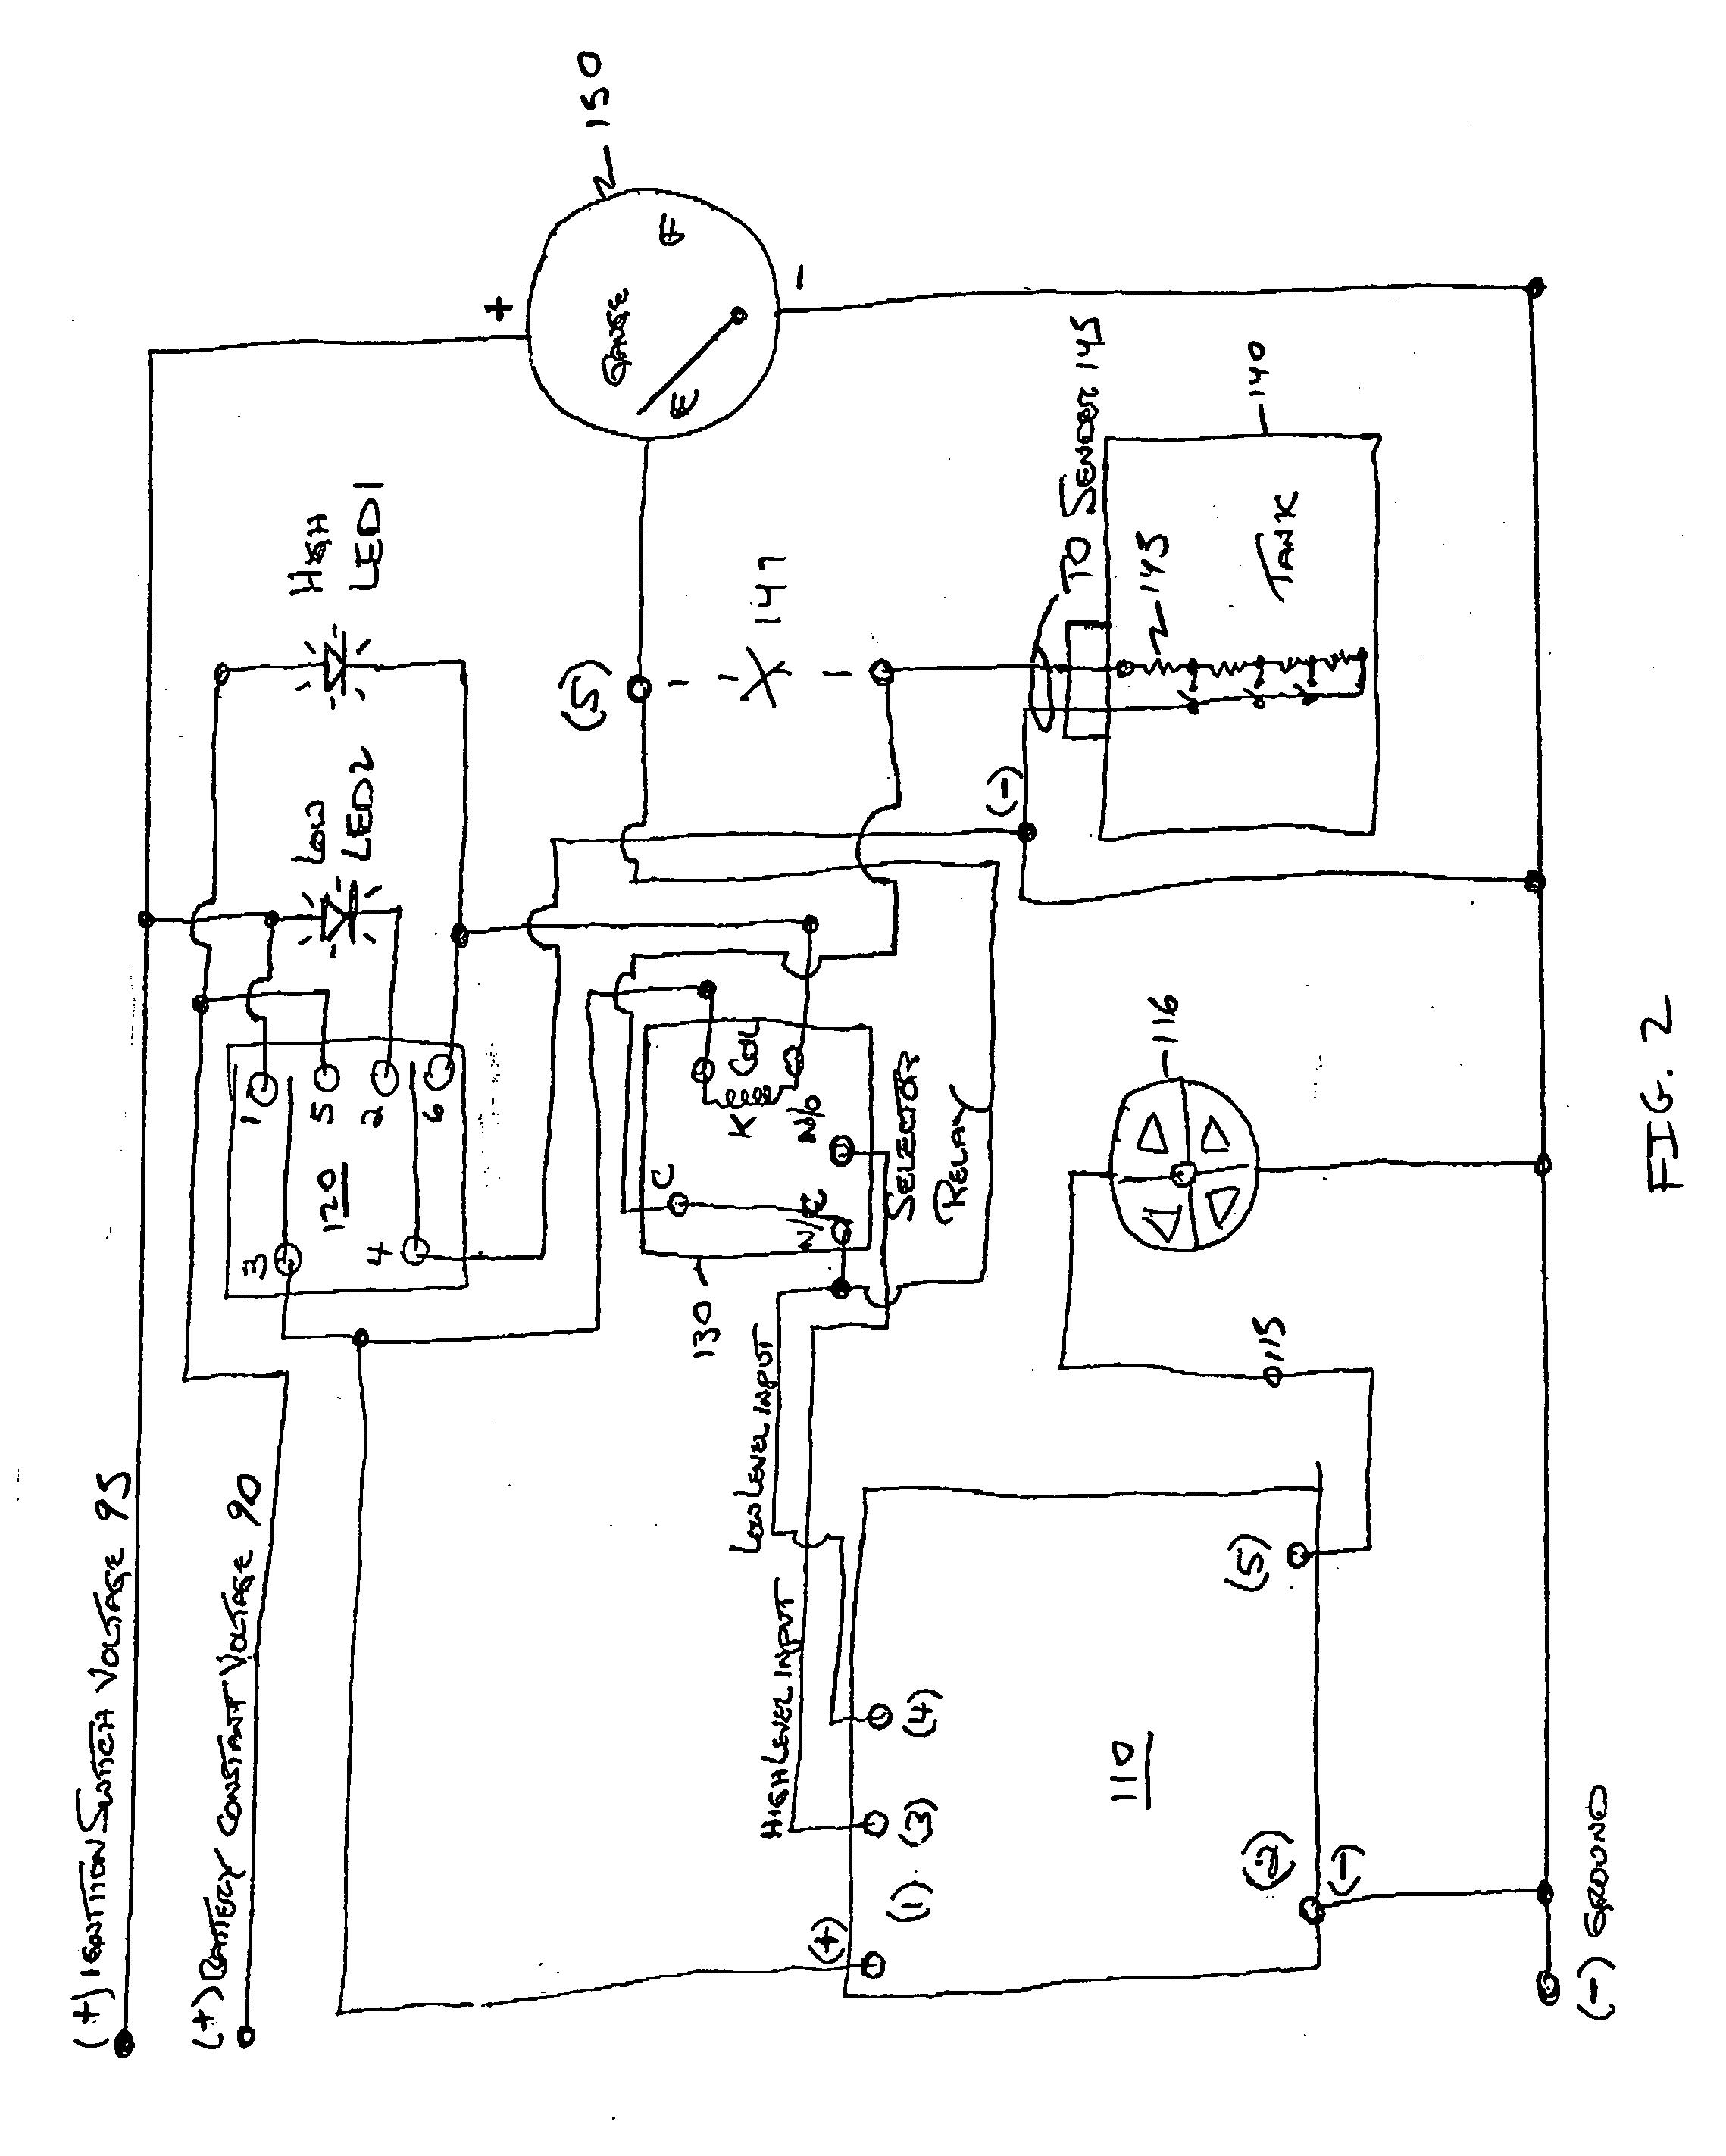 [DIAGRAM_3ER]  ZA_9839] Jrv Monitor Panel Wiring Diagram Jrv Circuit Diagrams Wiring  Diagram | Jrv Monitor Panel Wiring Diagram |  | Dogan Phae Mohammedshrine Librar Wiring 101